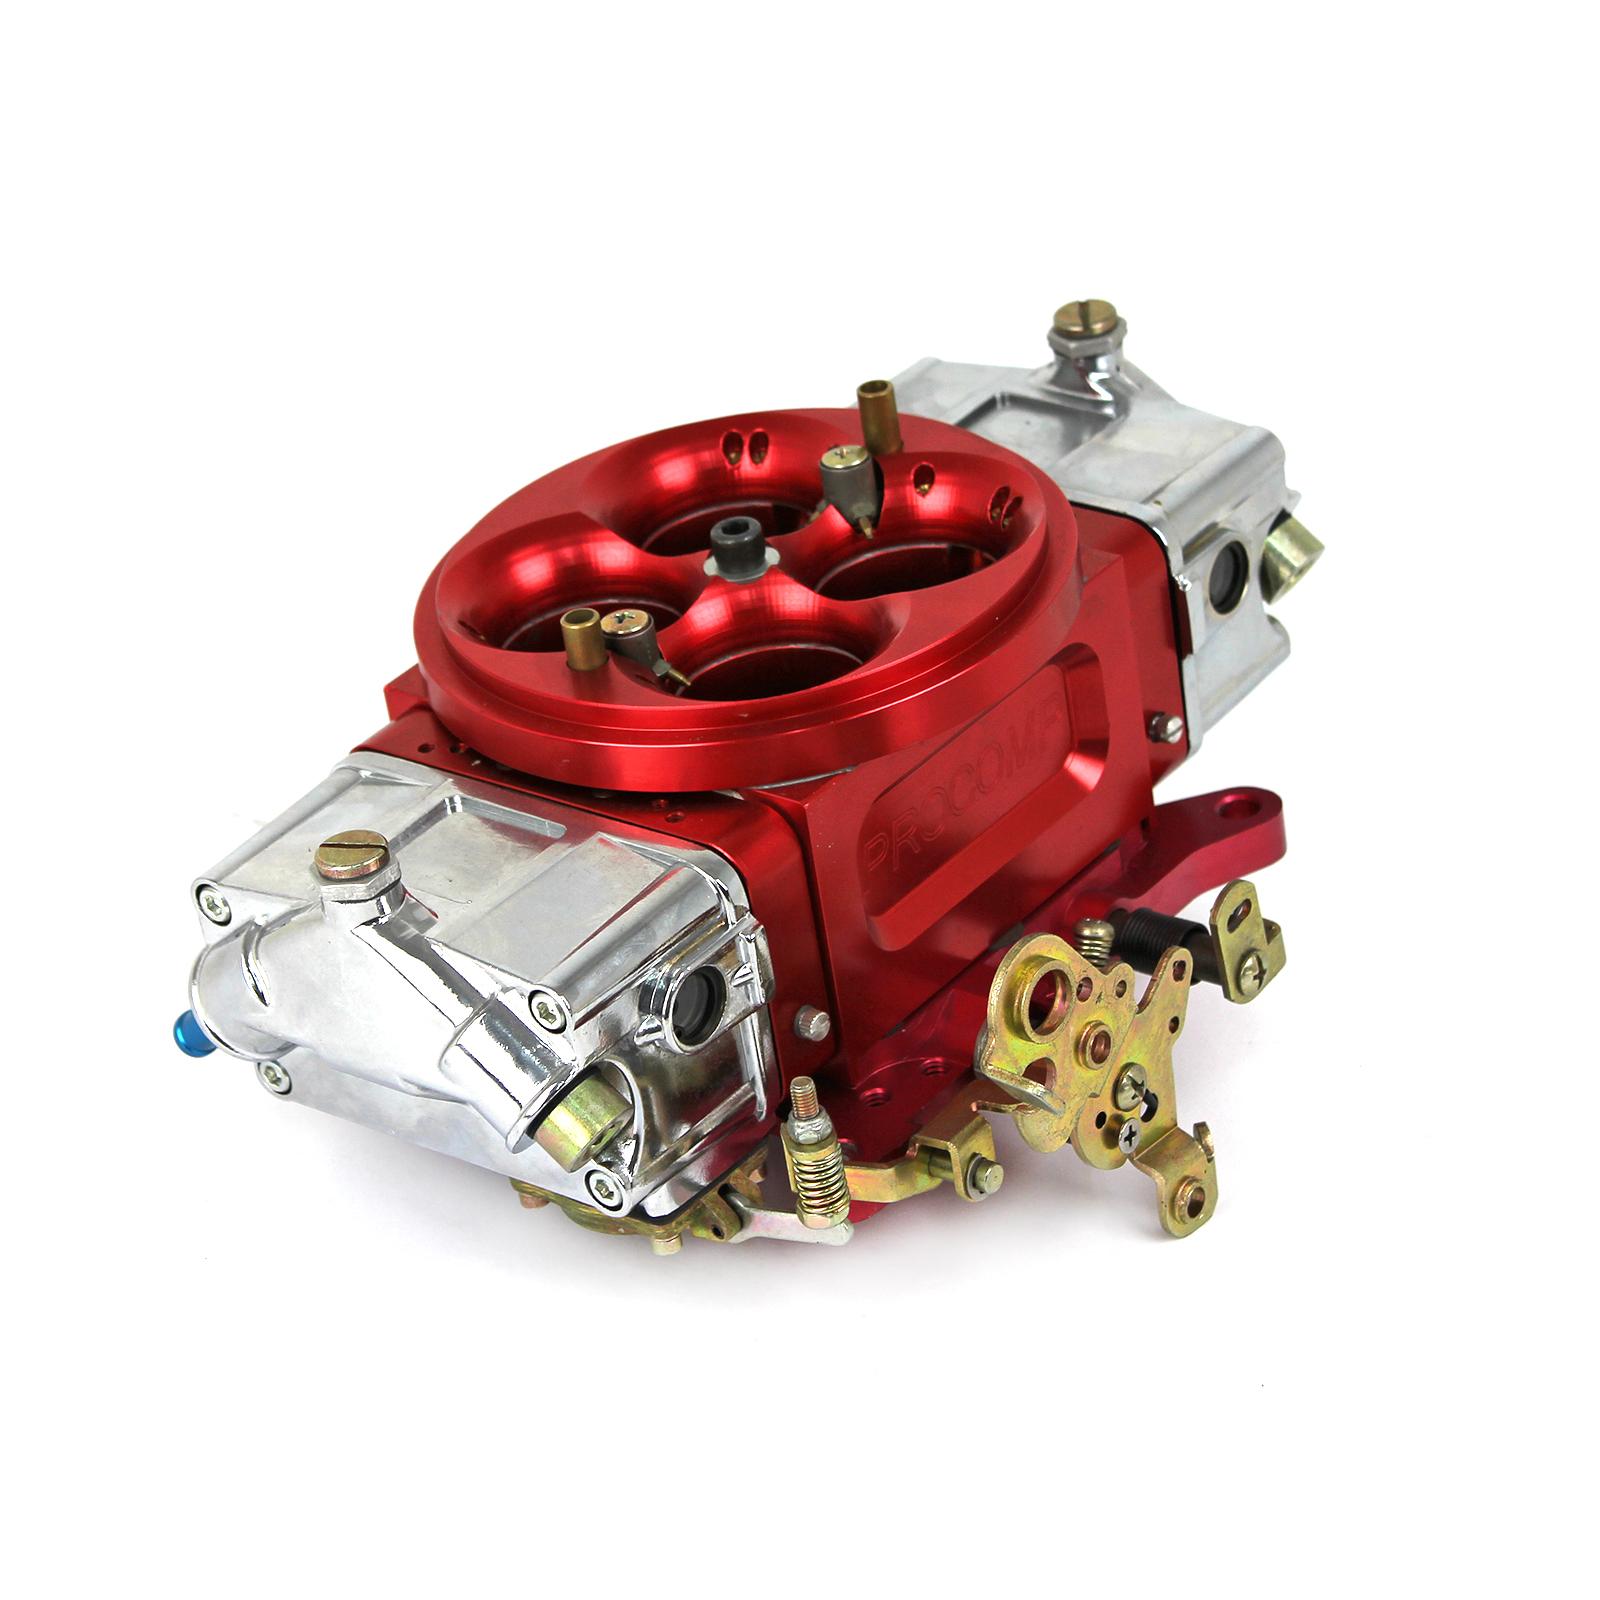 950 CFM Full Billet 4-Bbl Mechanical Sec Double Pumper Race Bred Carburetor 2C